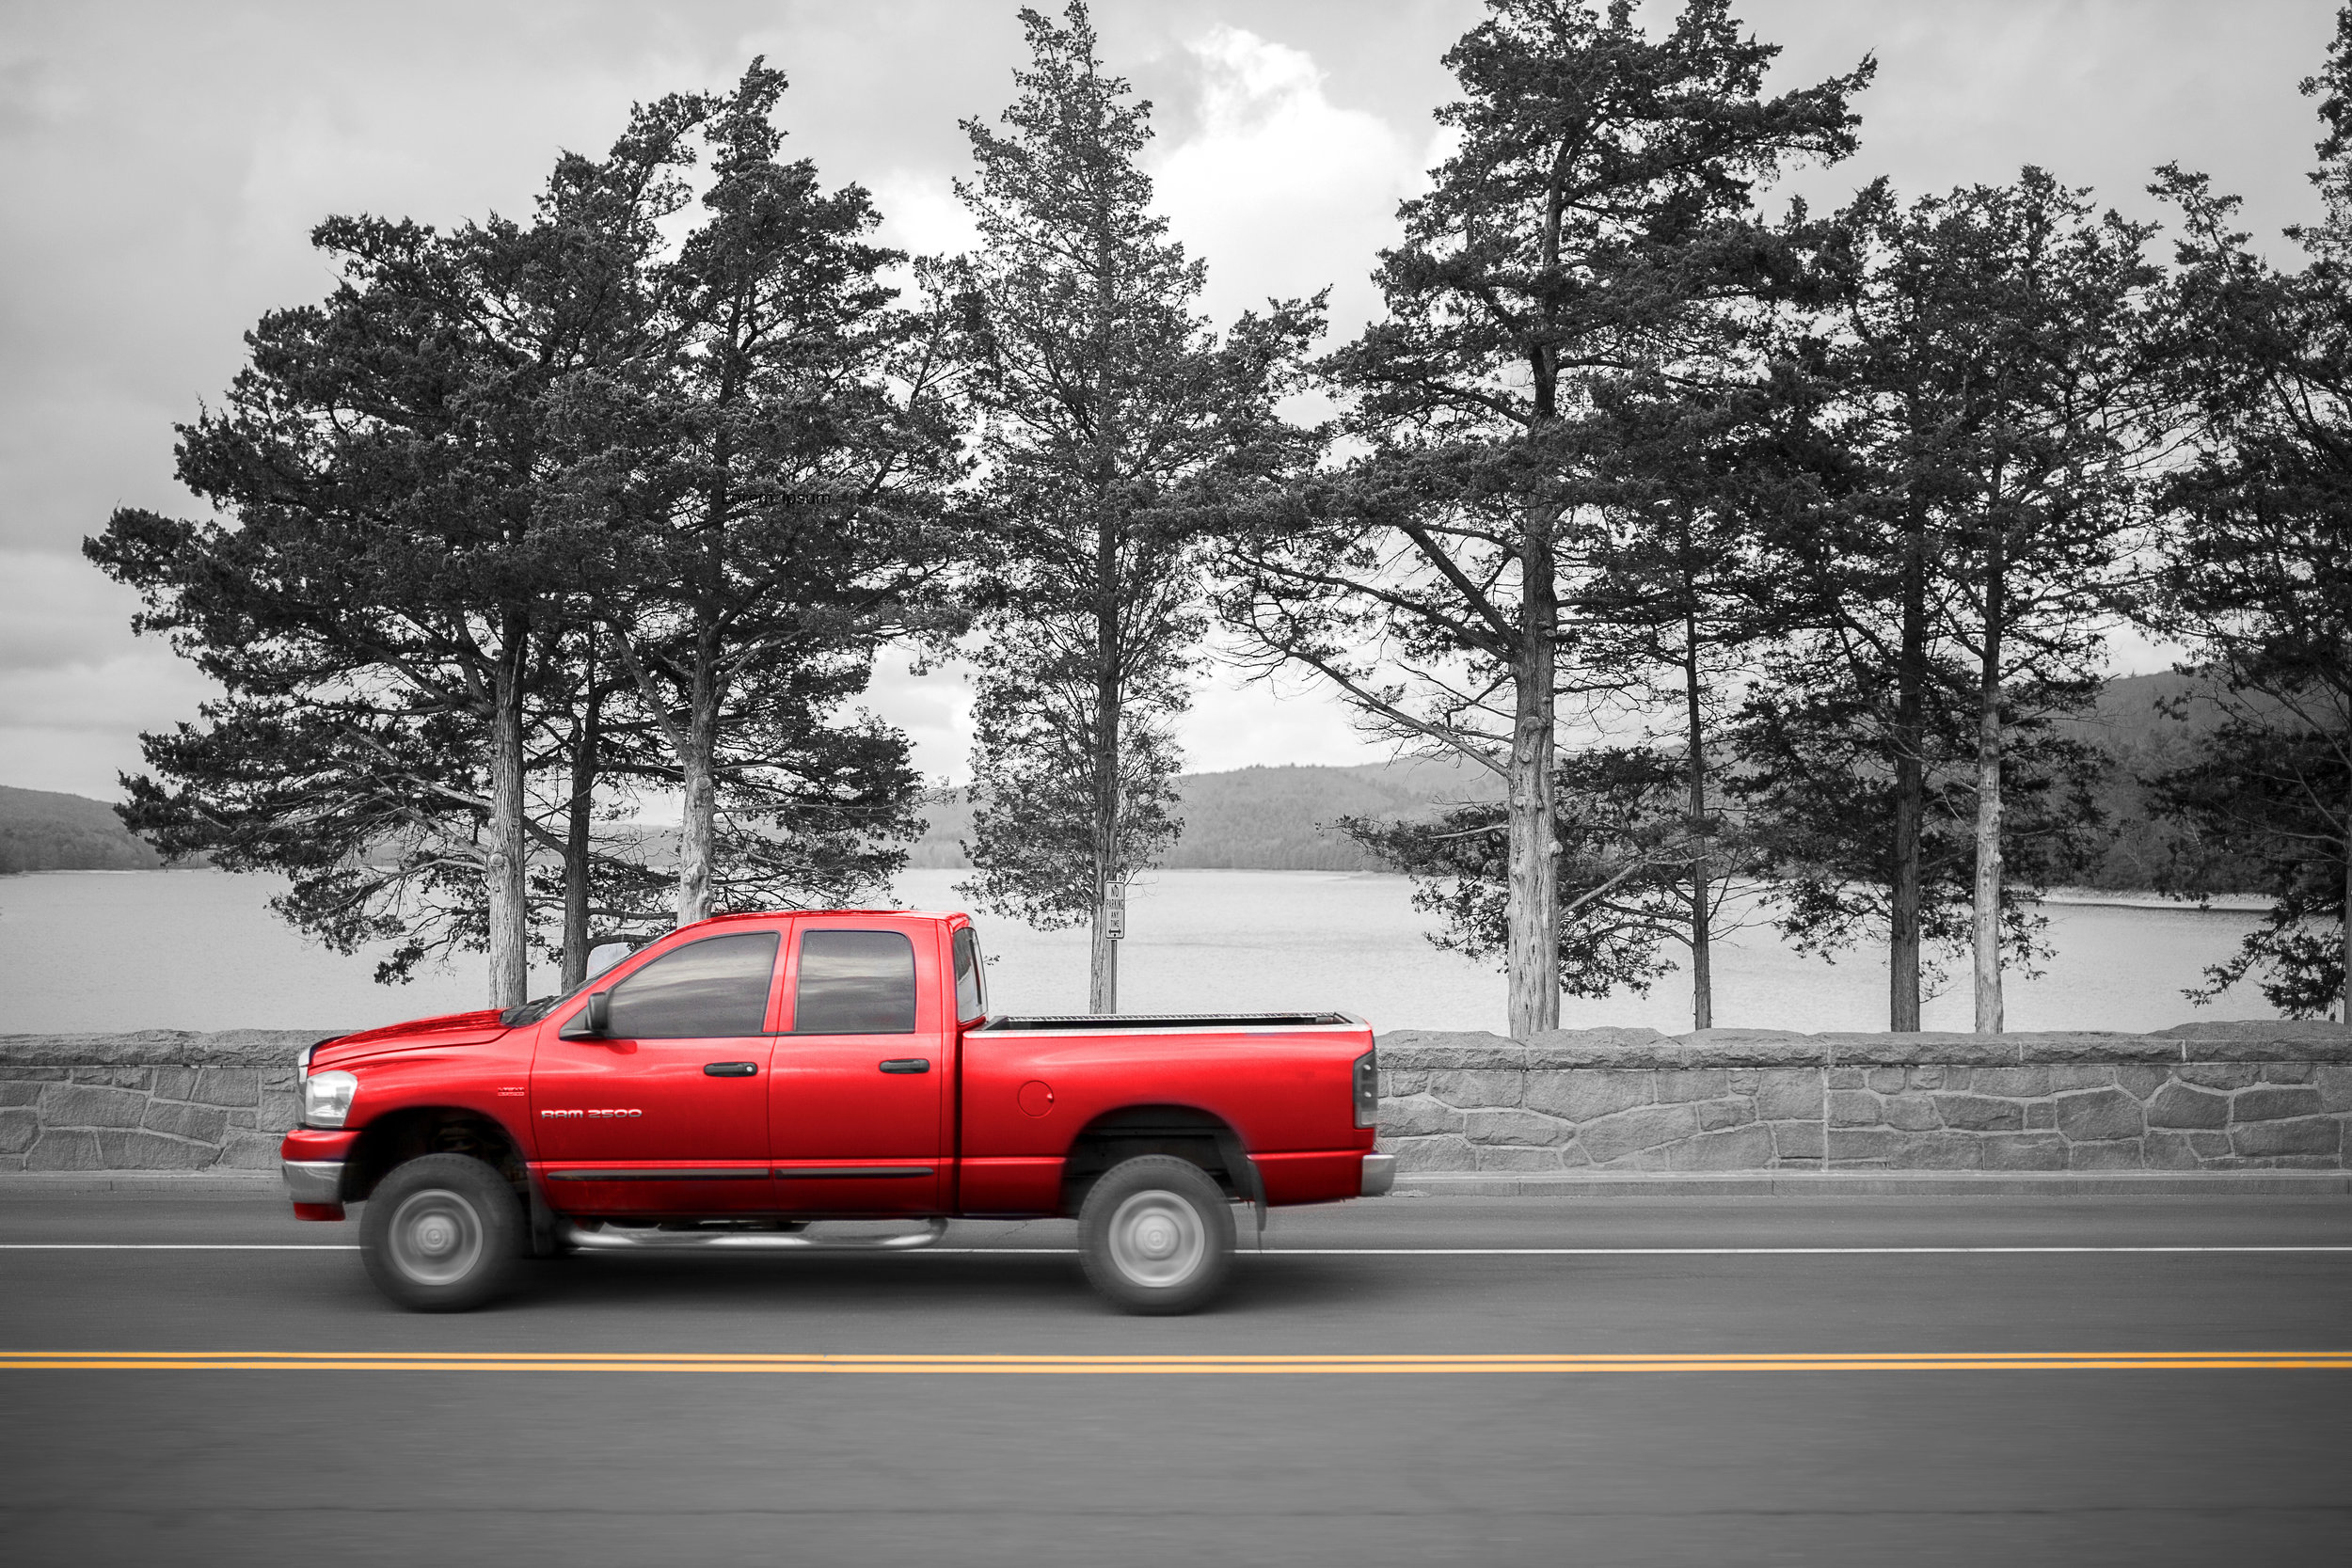 A red pick up truck near a lake